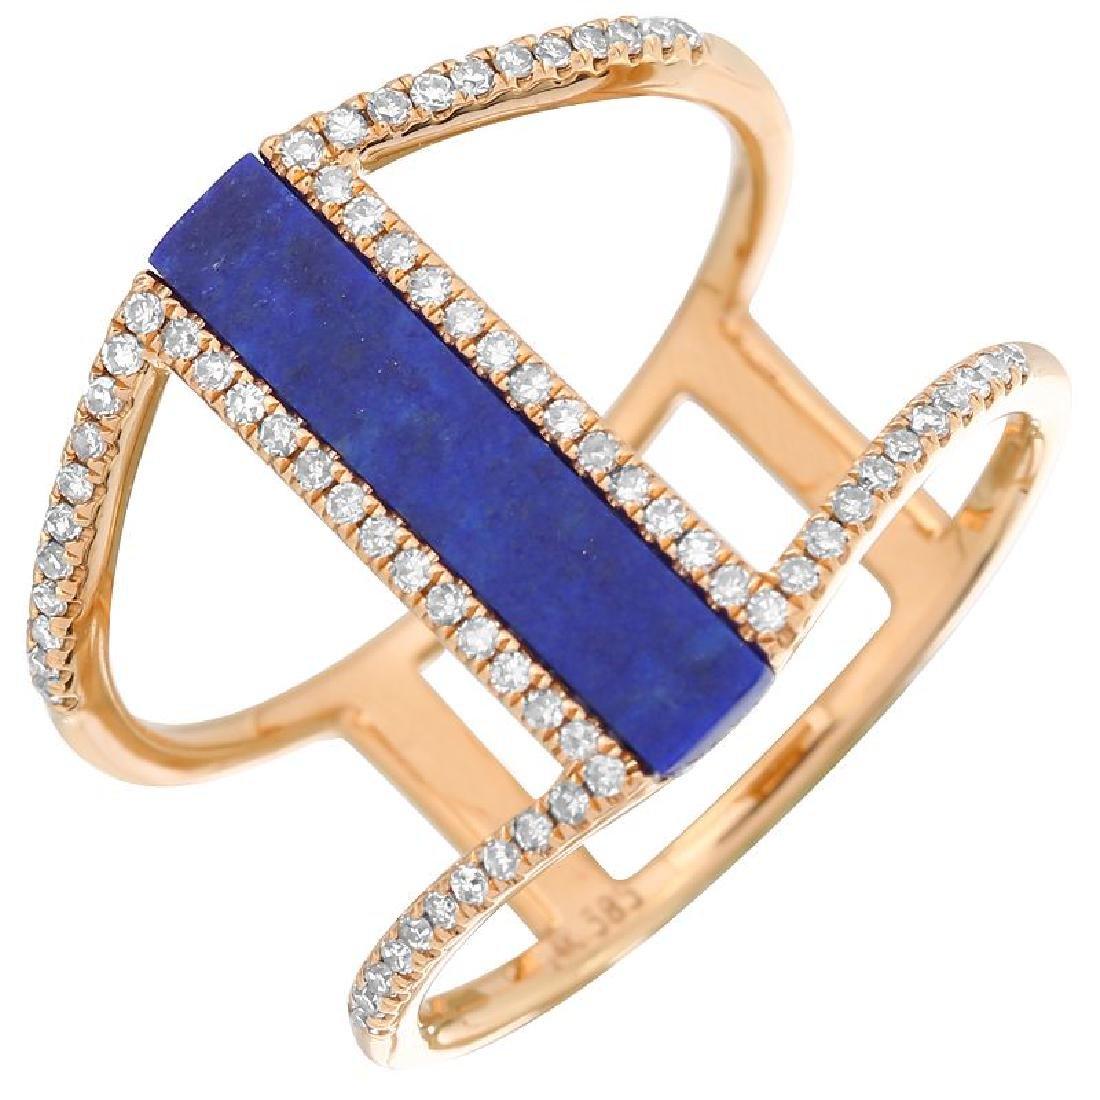 14KT Rose Gold Gemstone Ring - 2